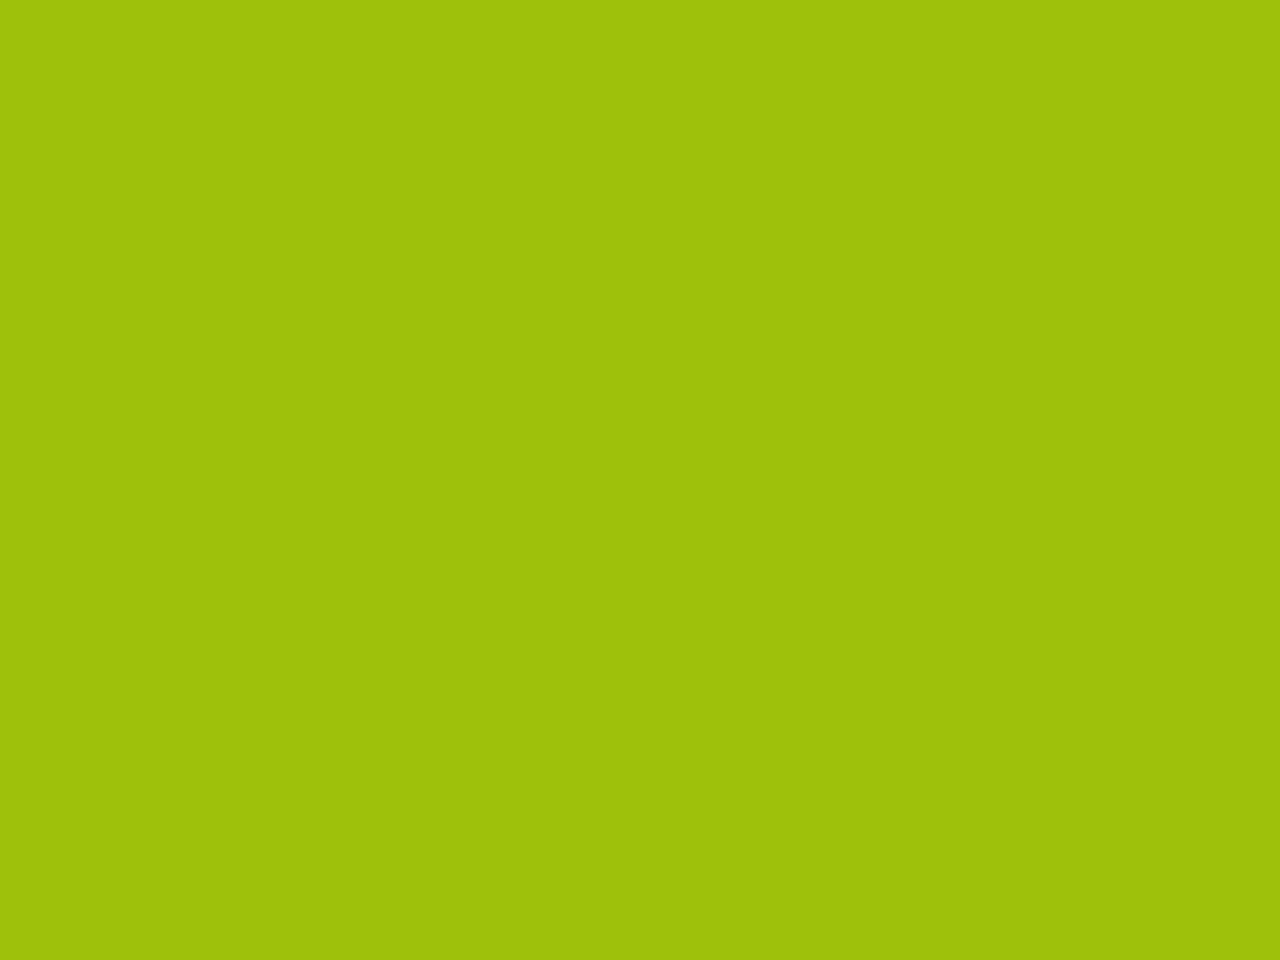 1280x960 Limerick Solid Color Background